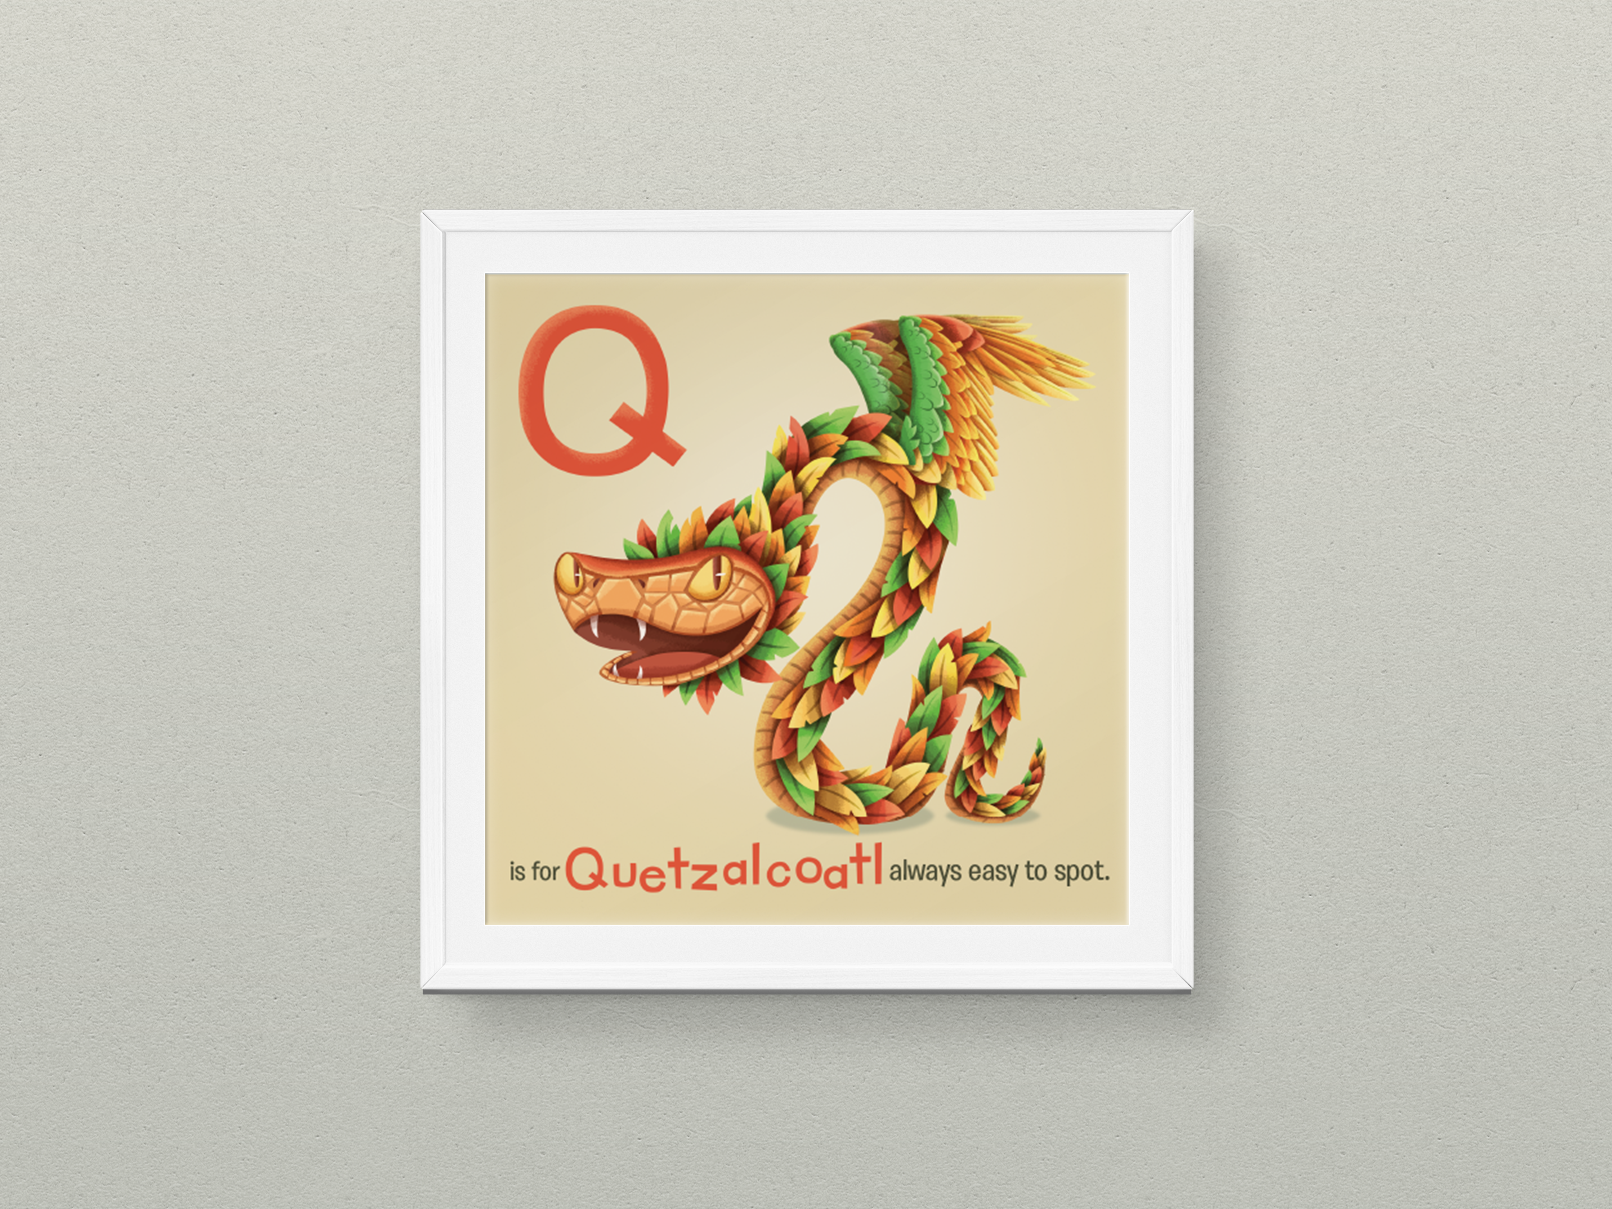 "Q is for Quetzalcoatl 6x6"" print, by  Hazy Dell Press"